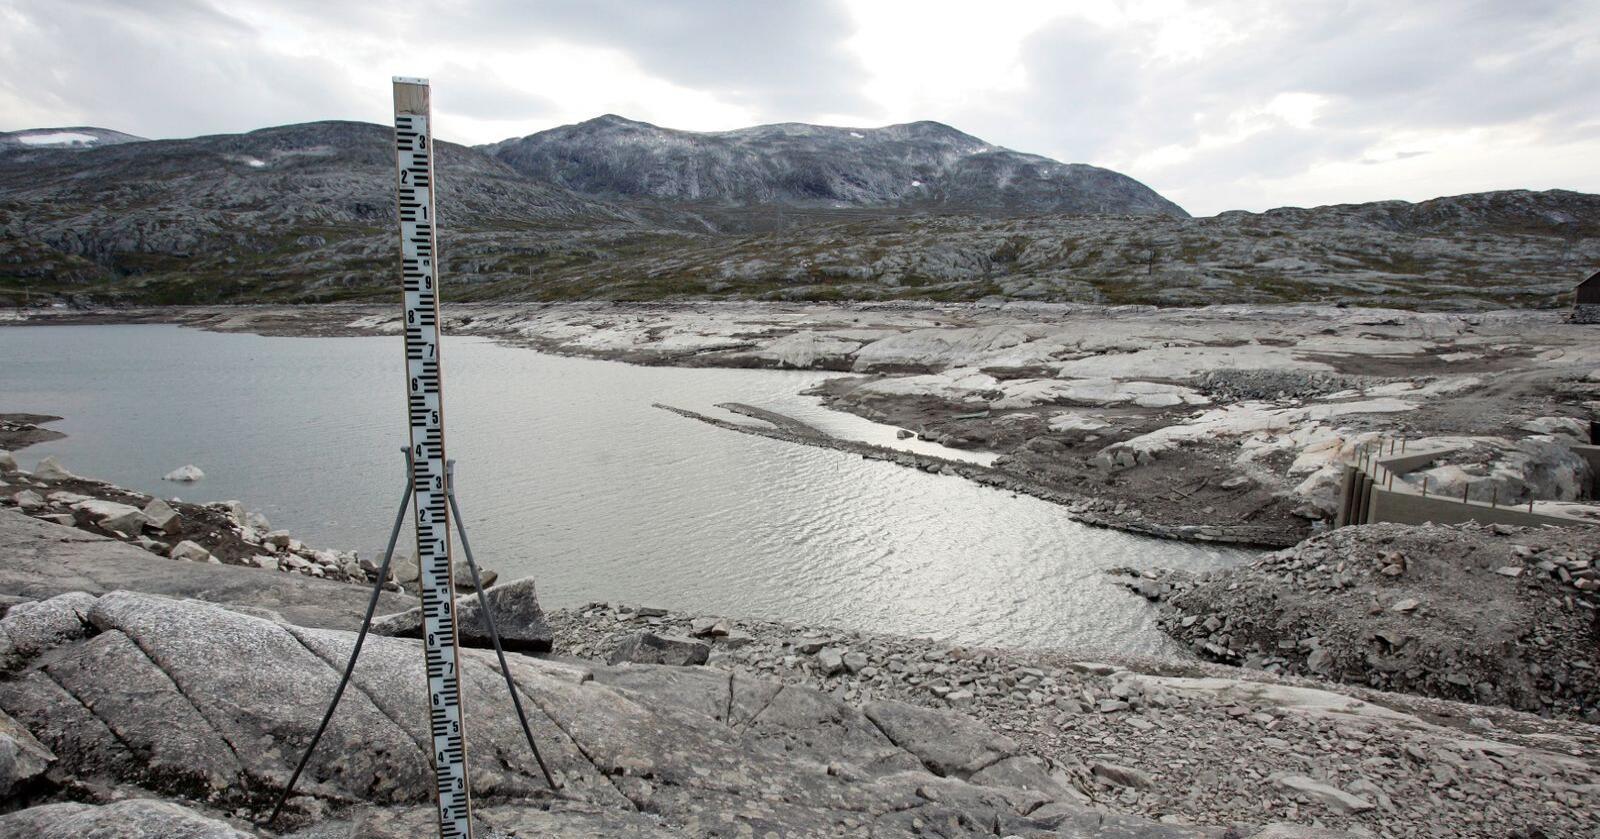 Vannmagasinet Osvatnet i Torbudalen ved Sunndalsøra fra et tidligere år da det også var lite vann i magasinet. Foto: Gorm Kallestad / NTB